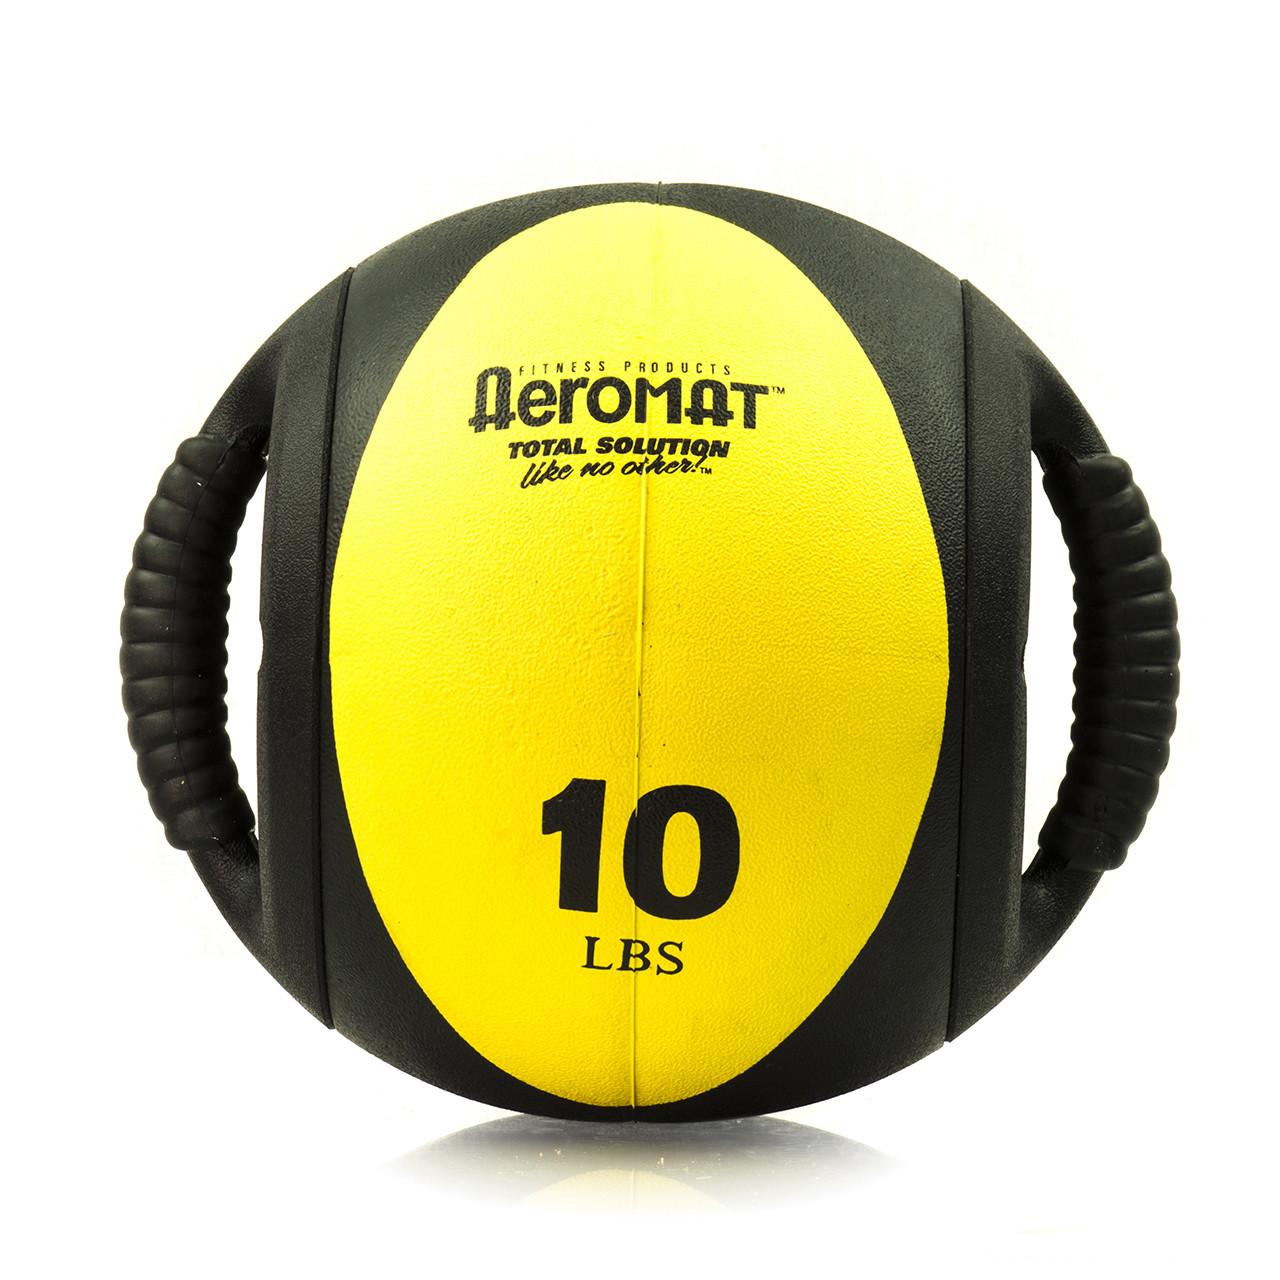 Aeromat Dual Grip Power Medicine Ball